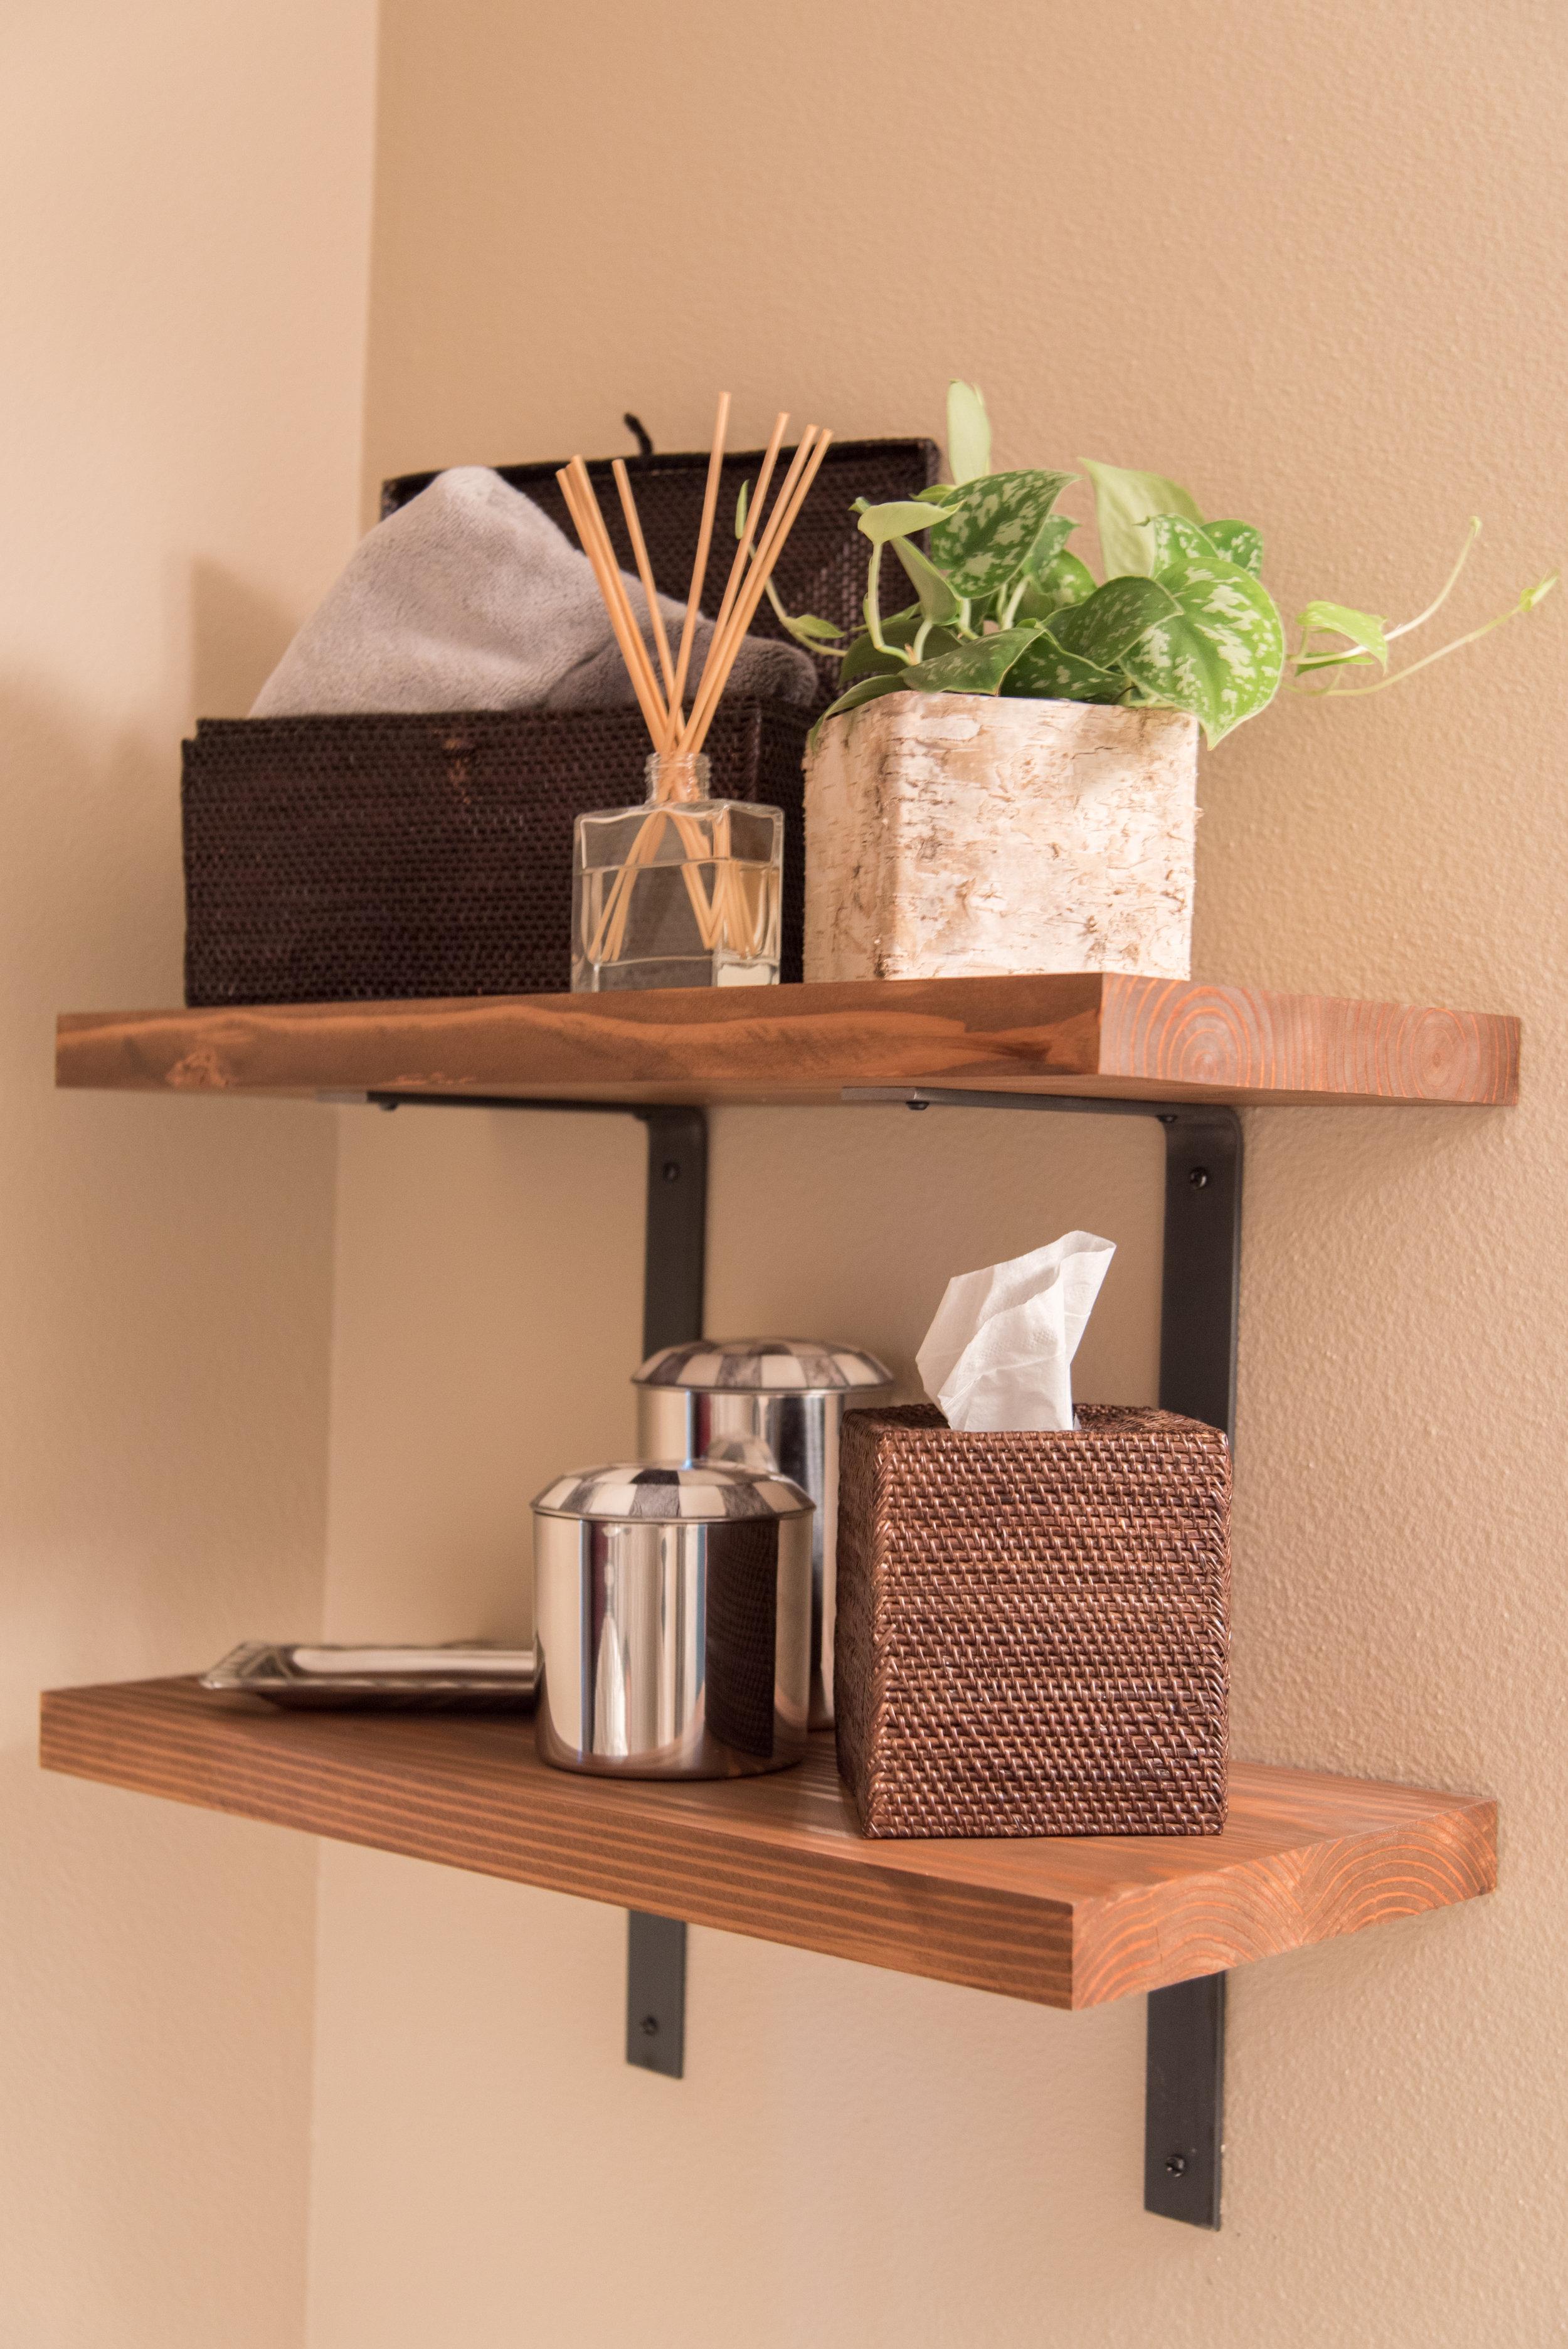 Shelves with custom brackets